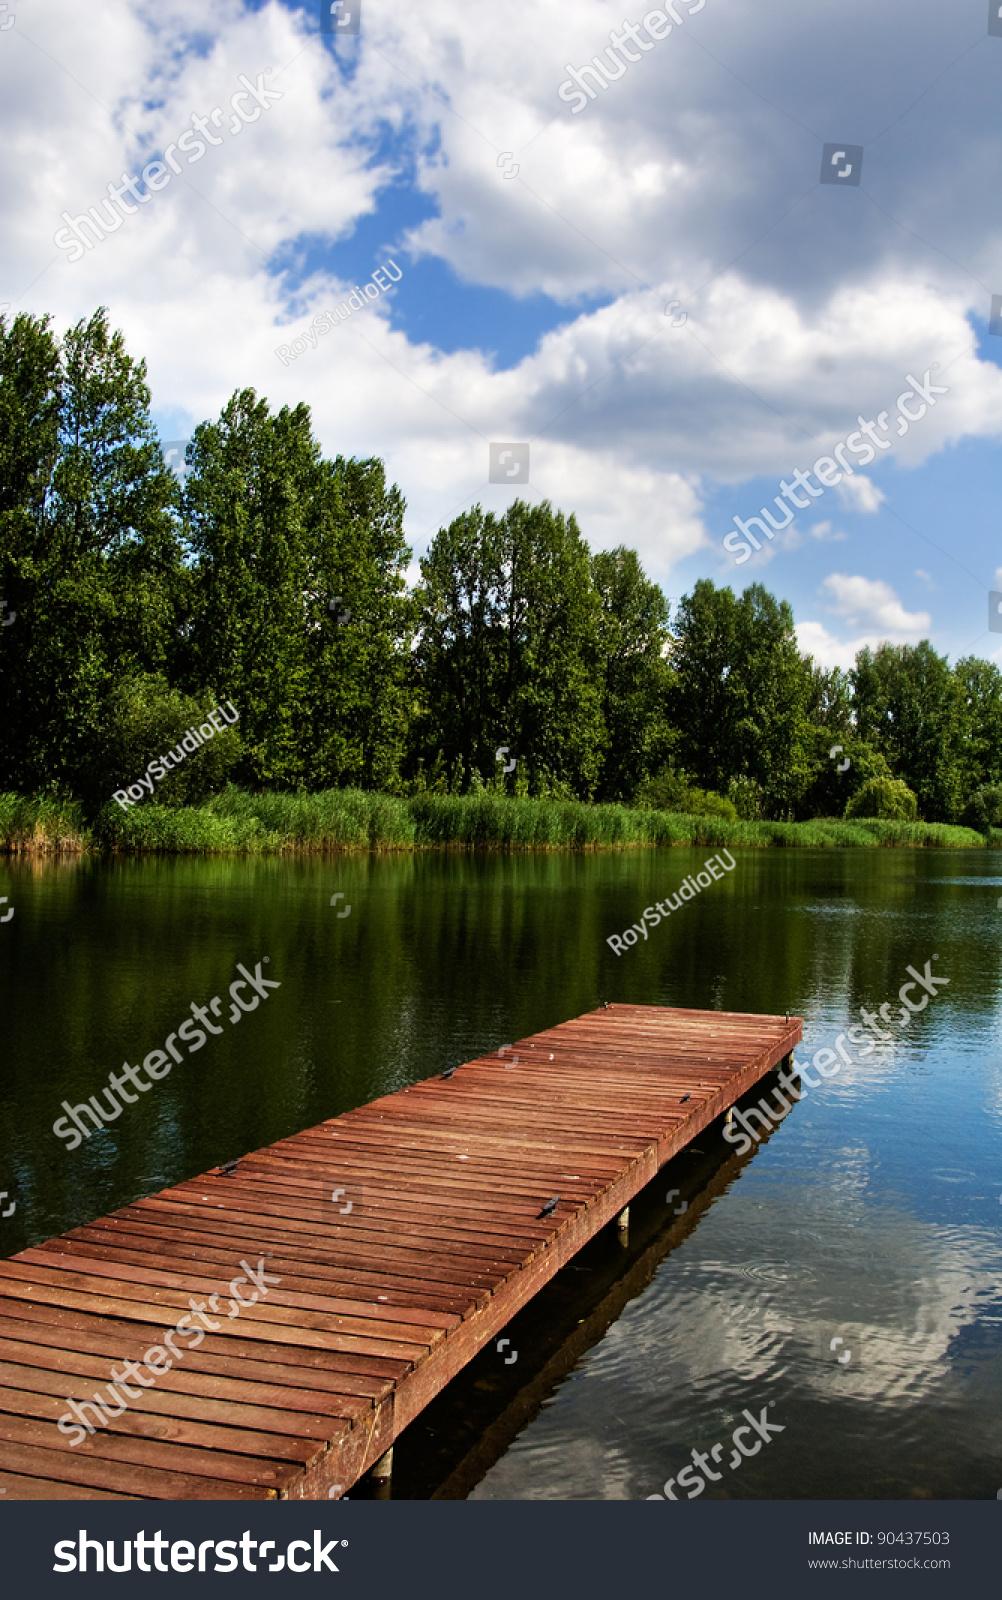 Log cabin on a lake royalty free stock photography image 7866317 - Island In A Lake On An Island In A Lake On An Island Image Of